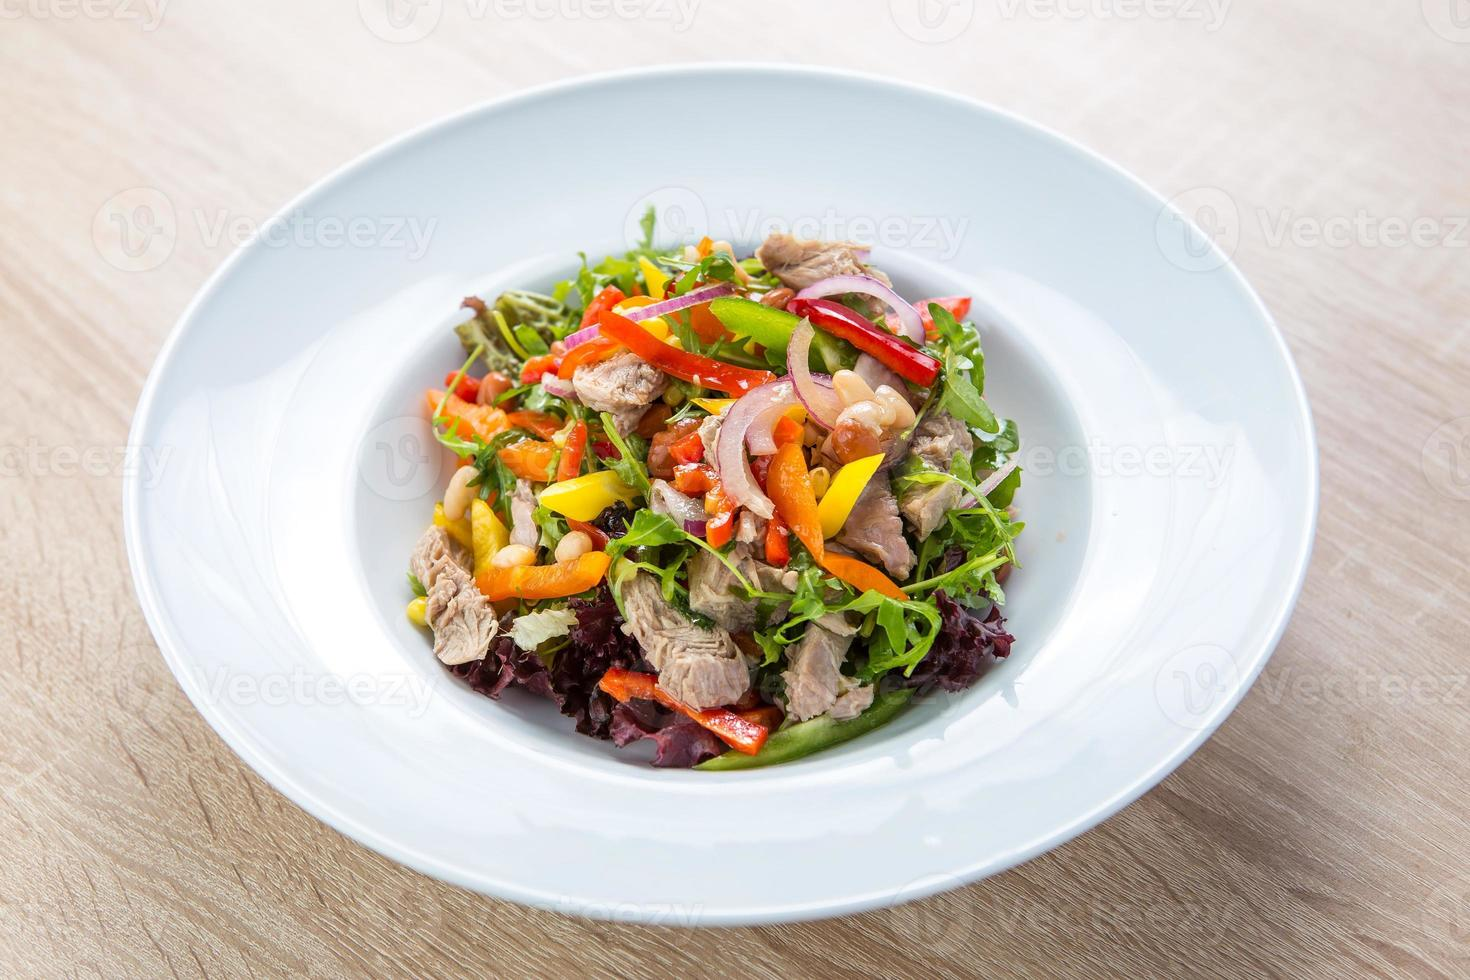 Tuna salad with vegetables photo